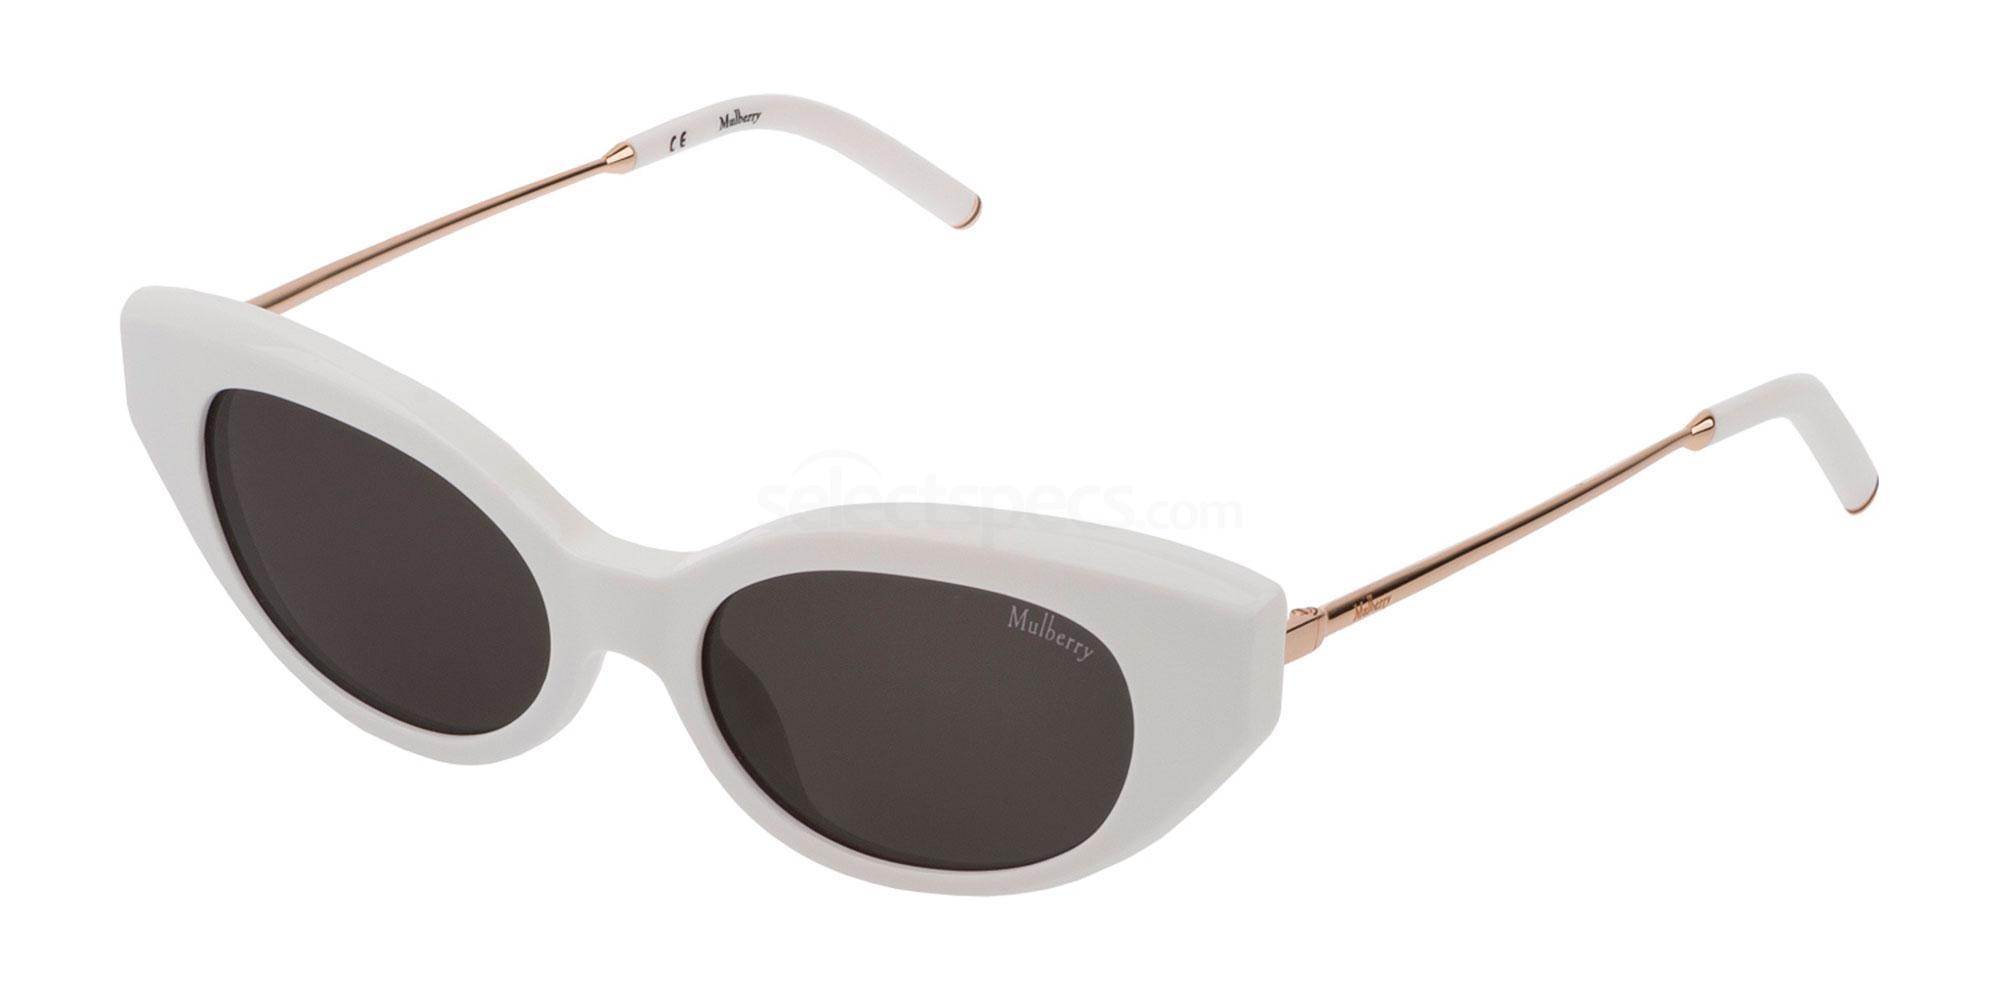 0847 SML005 Sunglasses, Mulberry